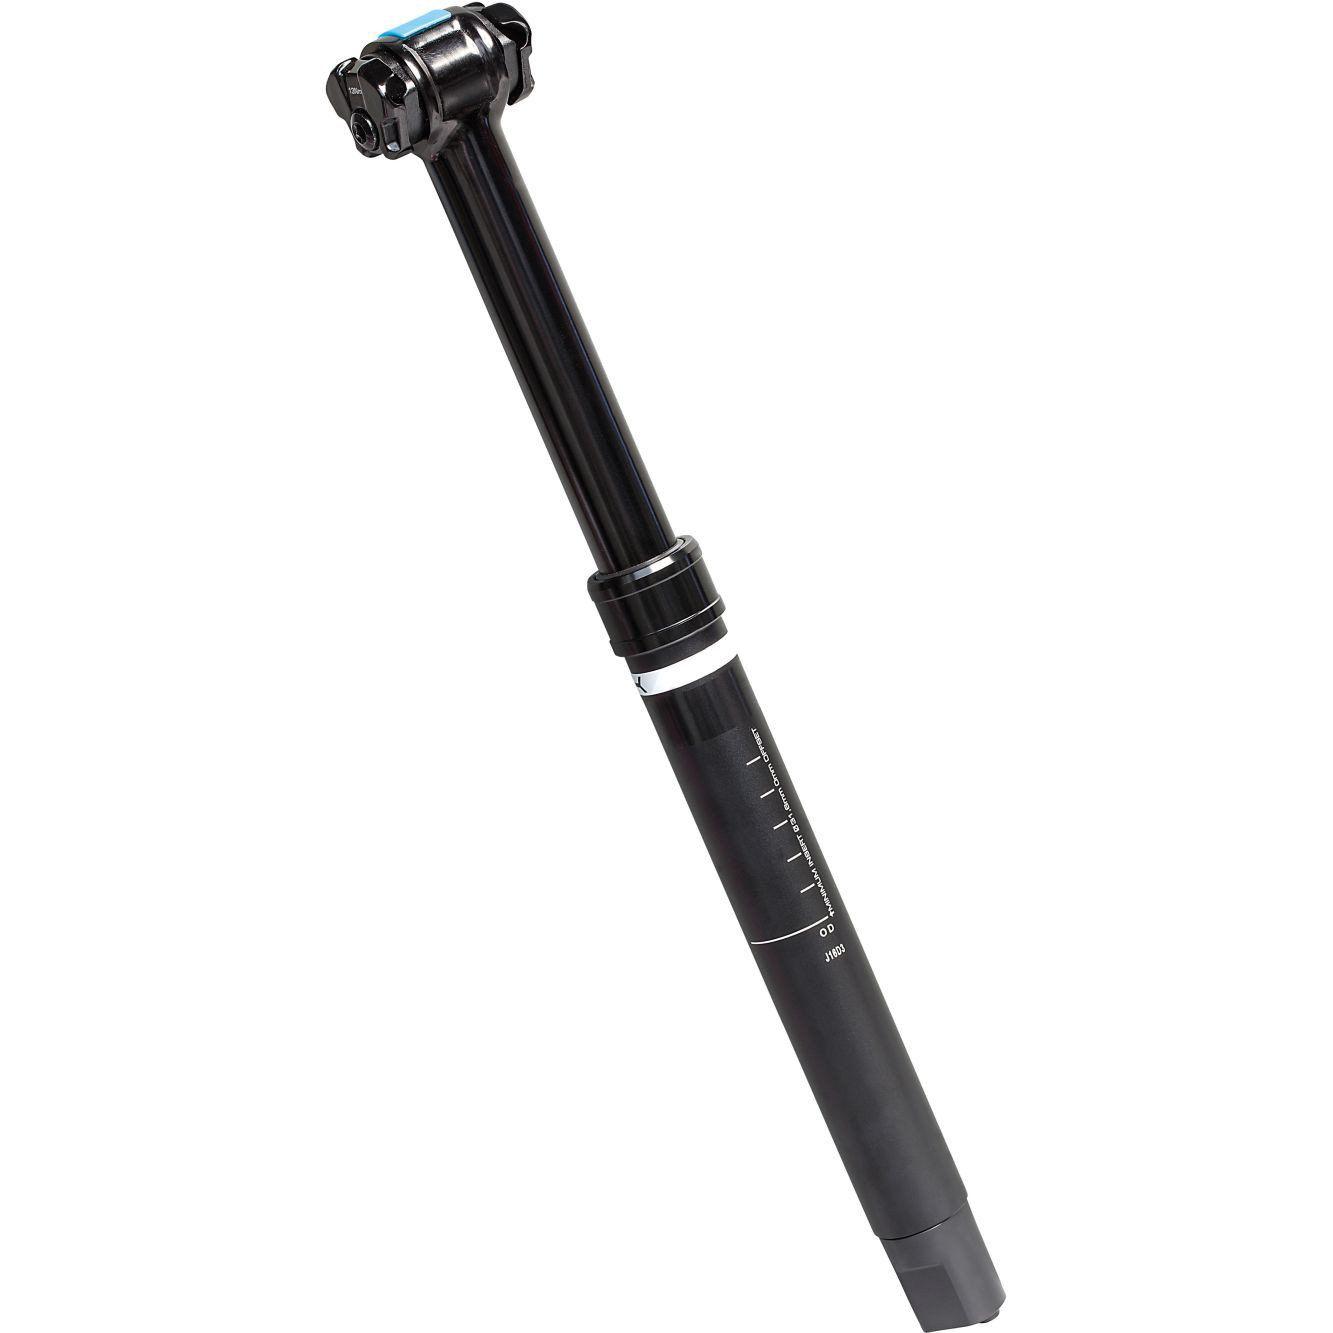 Canote Retrátil Shimano Pro Koryak Adjust - Interno 30.9x400mm  - IBIKES